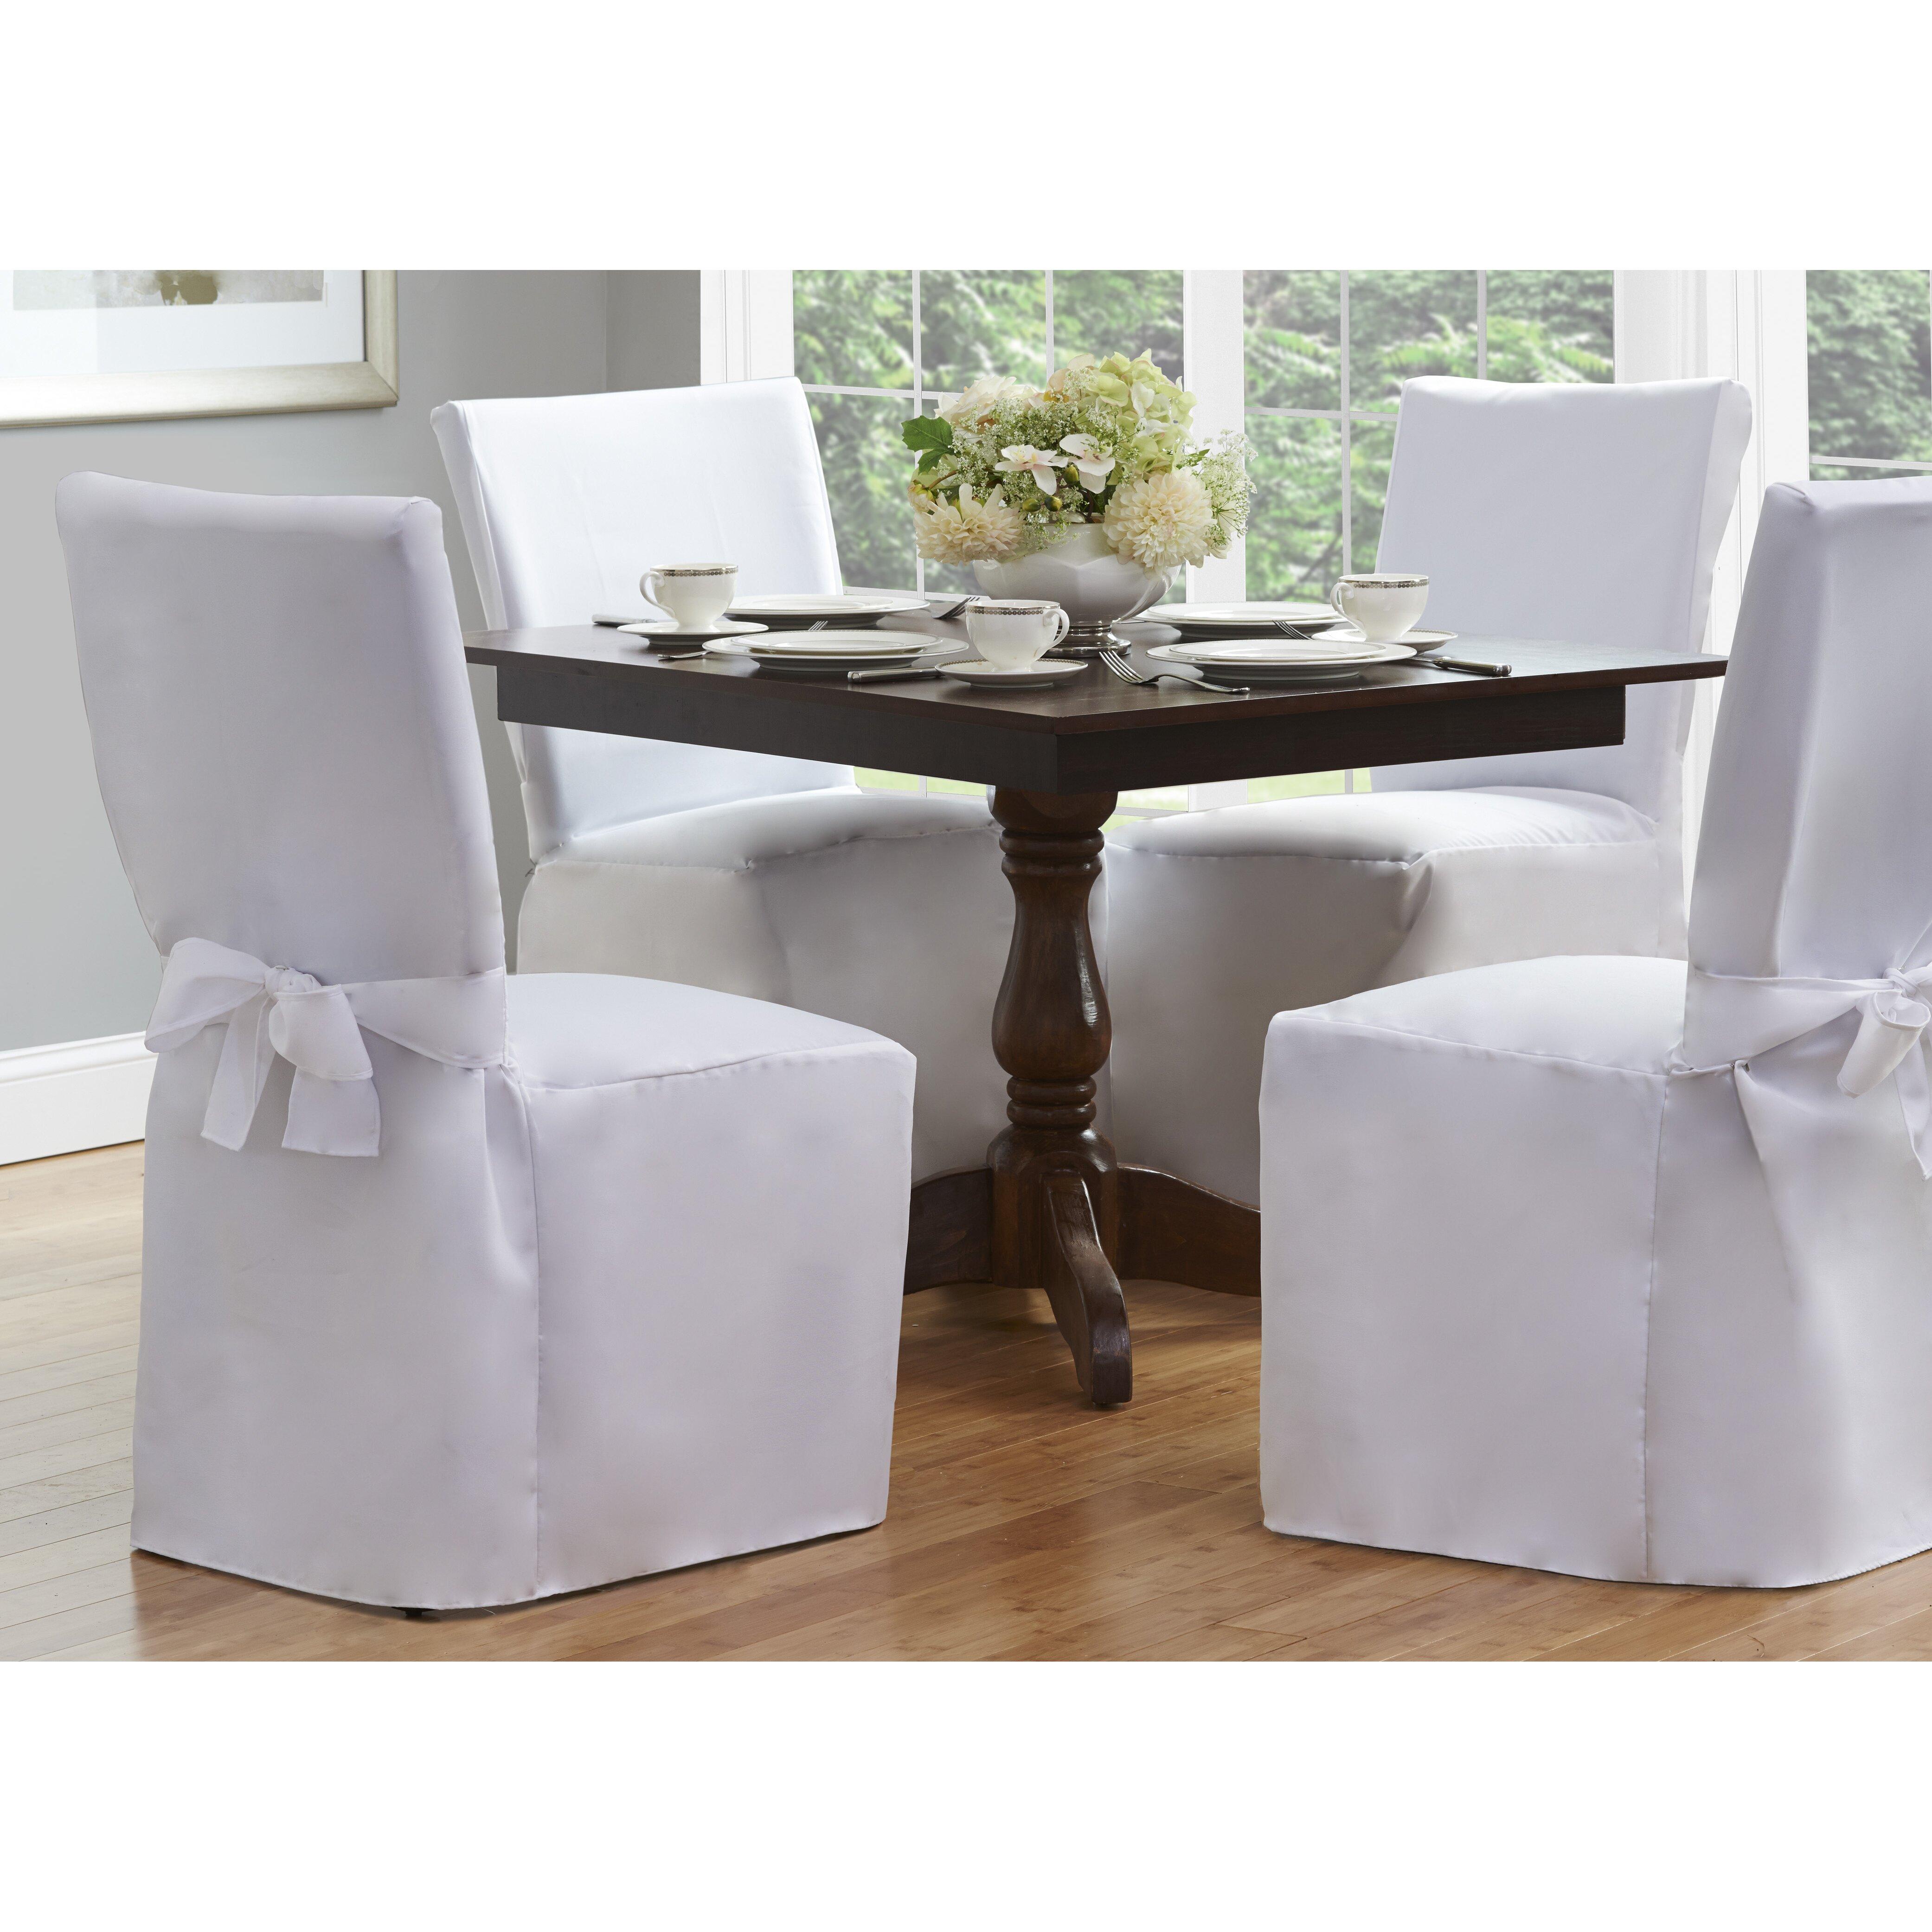 Csn Furniture: Fresh Ideas Dining Chair Slipcover & Reviews